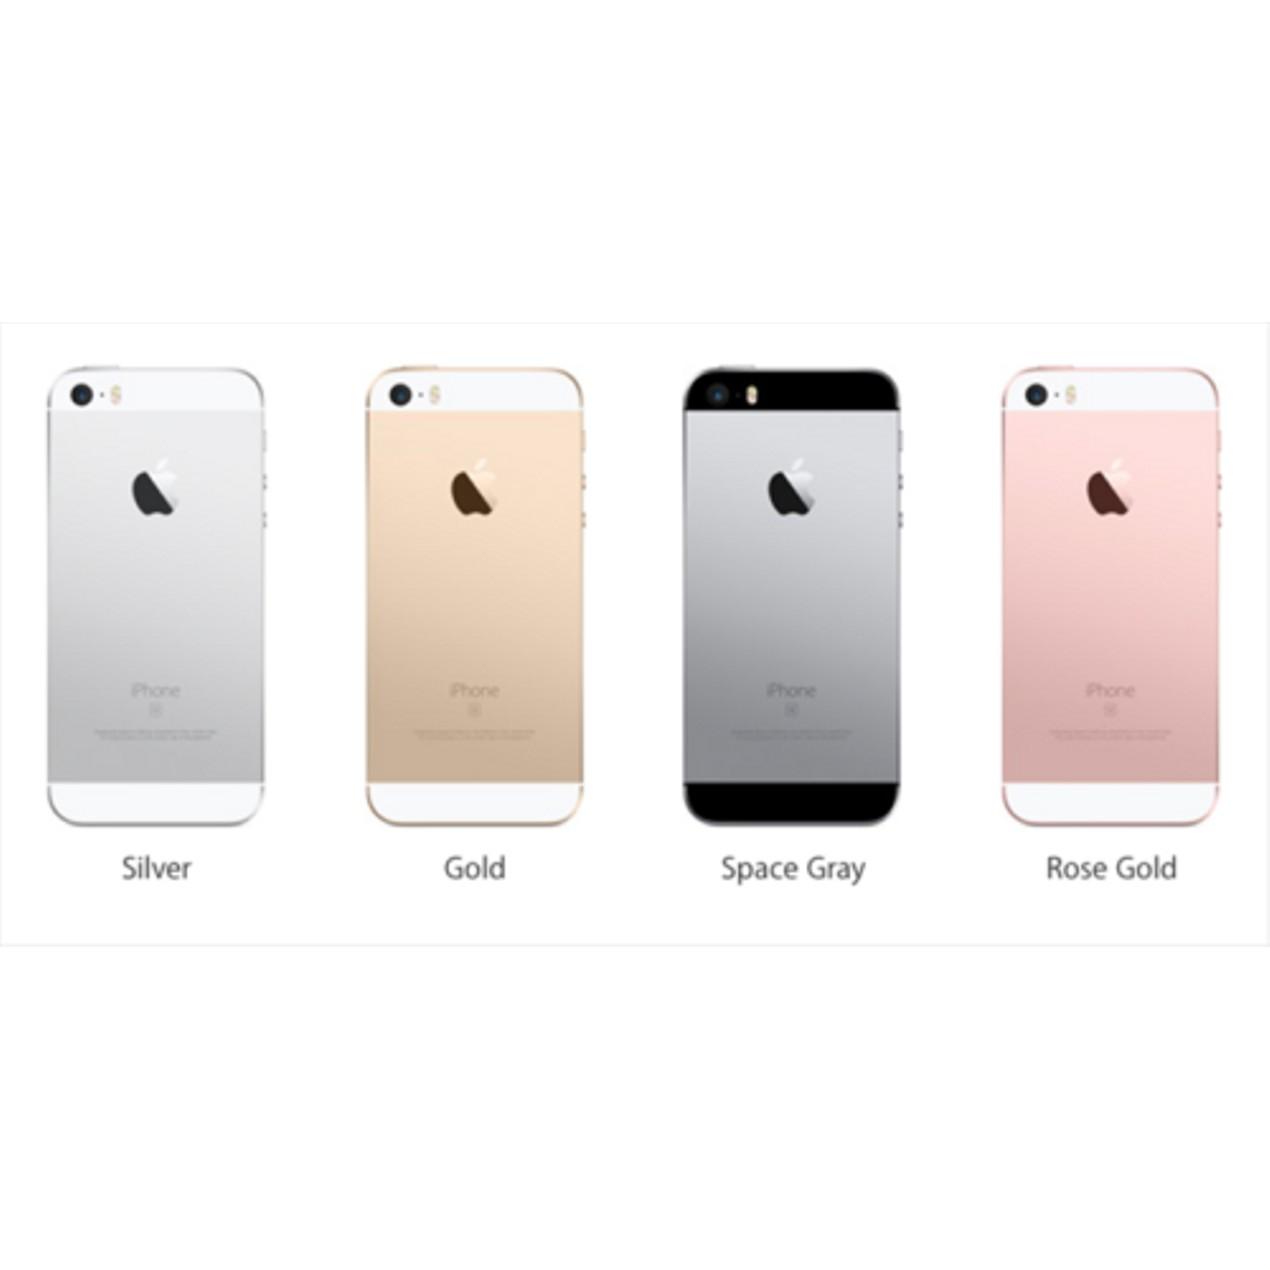 Apple Iphone Se 16gb 32gb 64gb Unlocked Black Rose Gold Silver Tanga